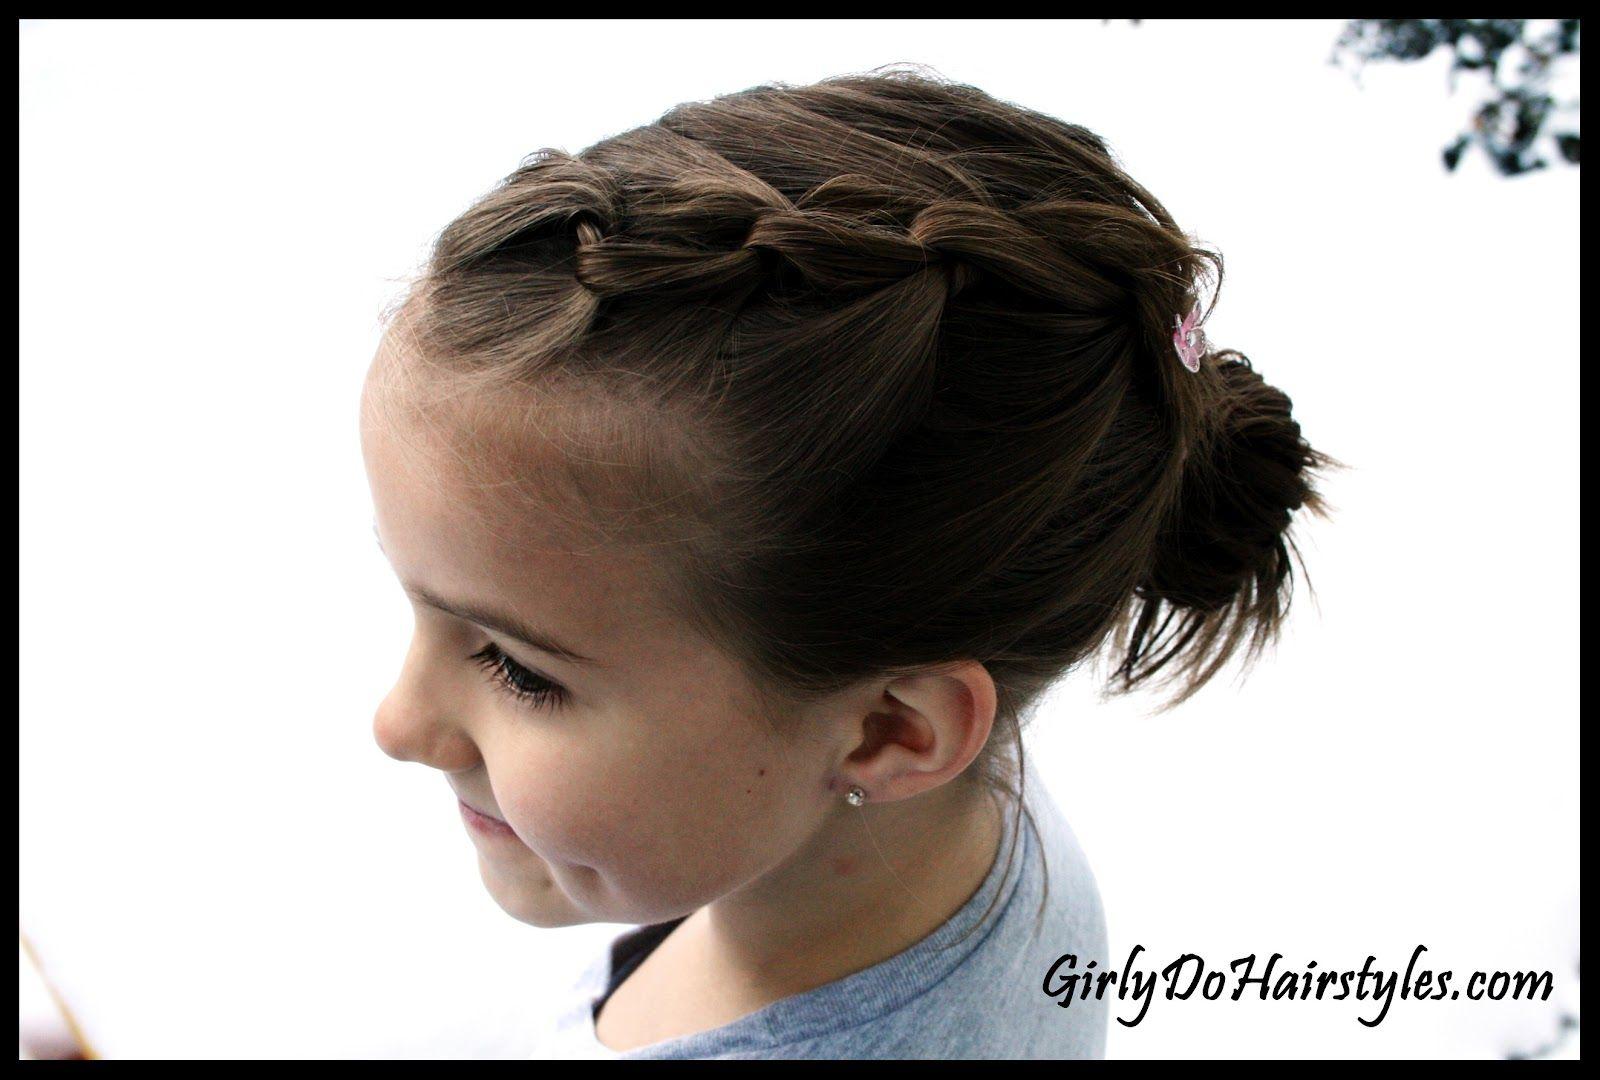 Girly do hairstyles by jenn chain braiding kid hair pinterest